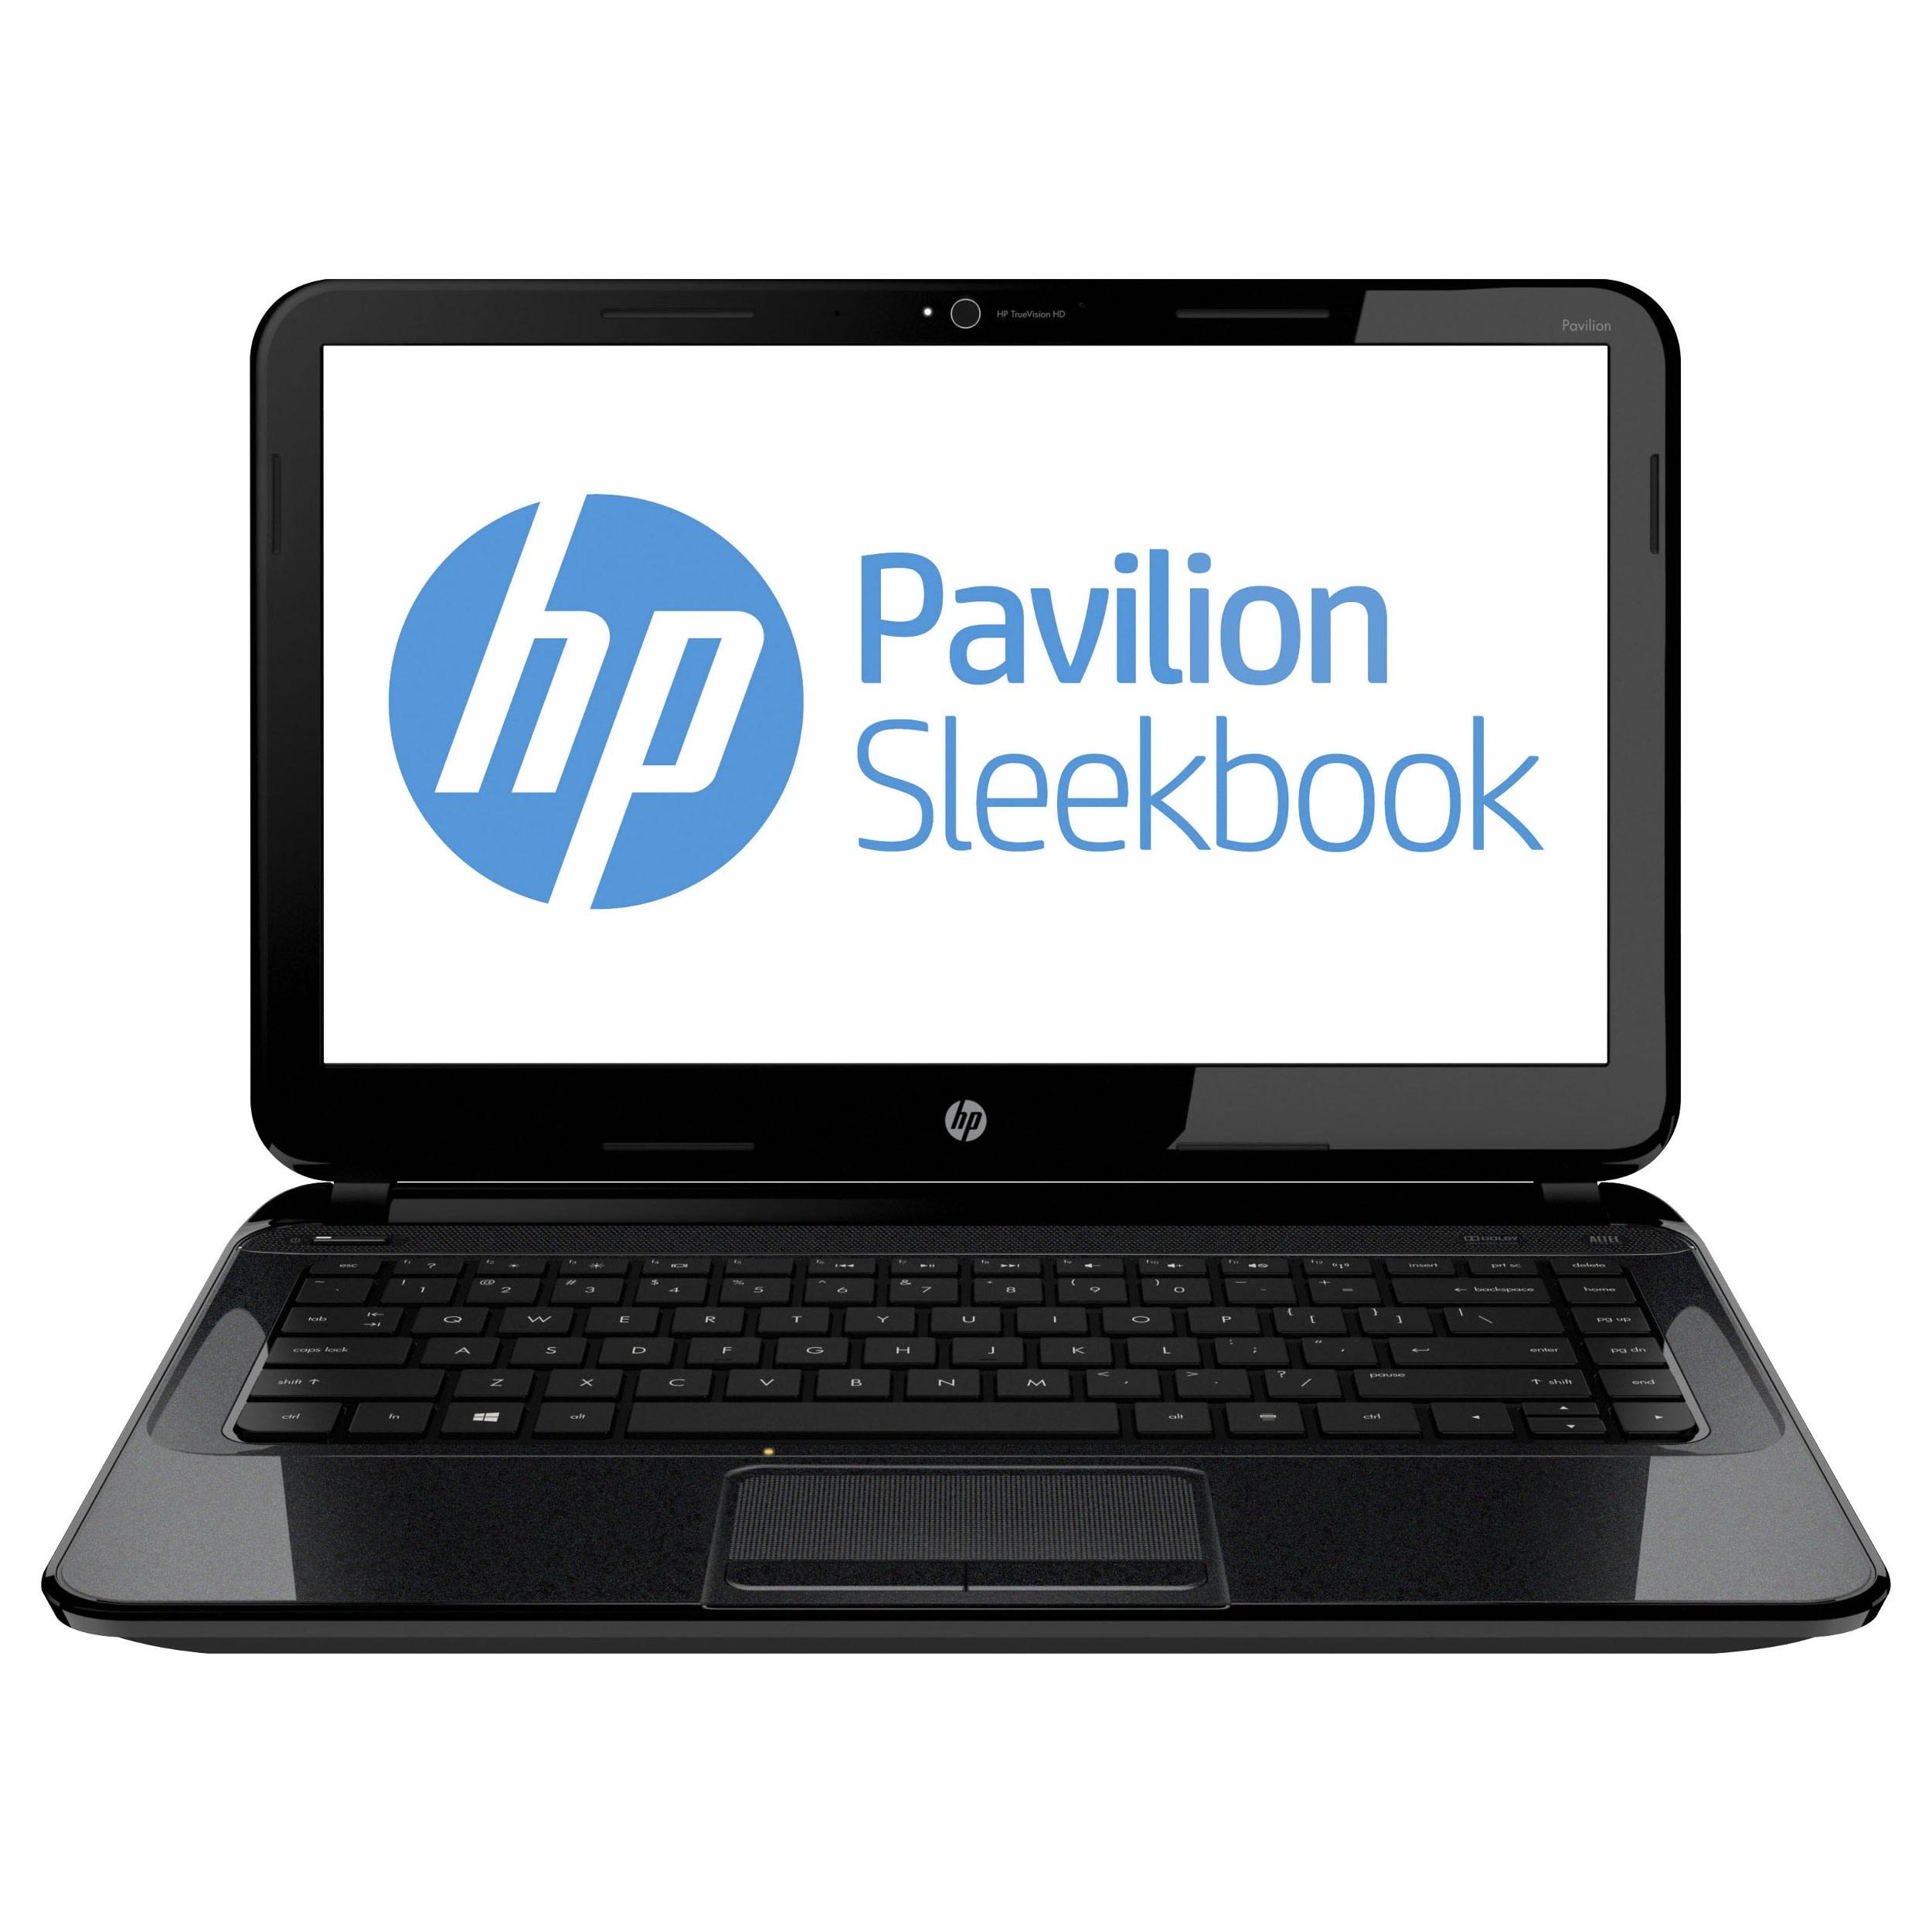 "HP Pavilion 15-n000 15-n010us 15.6"" LCD Notebook - AMD A-Series A6-5200 Quad-core (4 Core) 2 GHz - 4 GB DDR3L SDRAM - 500 GB HDD - Windows 8 - 1366 x 768 - BrightView"